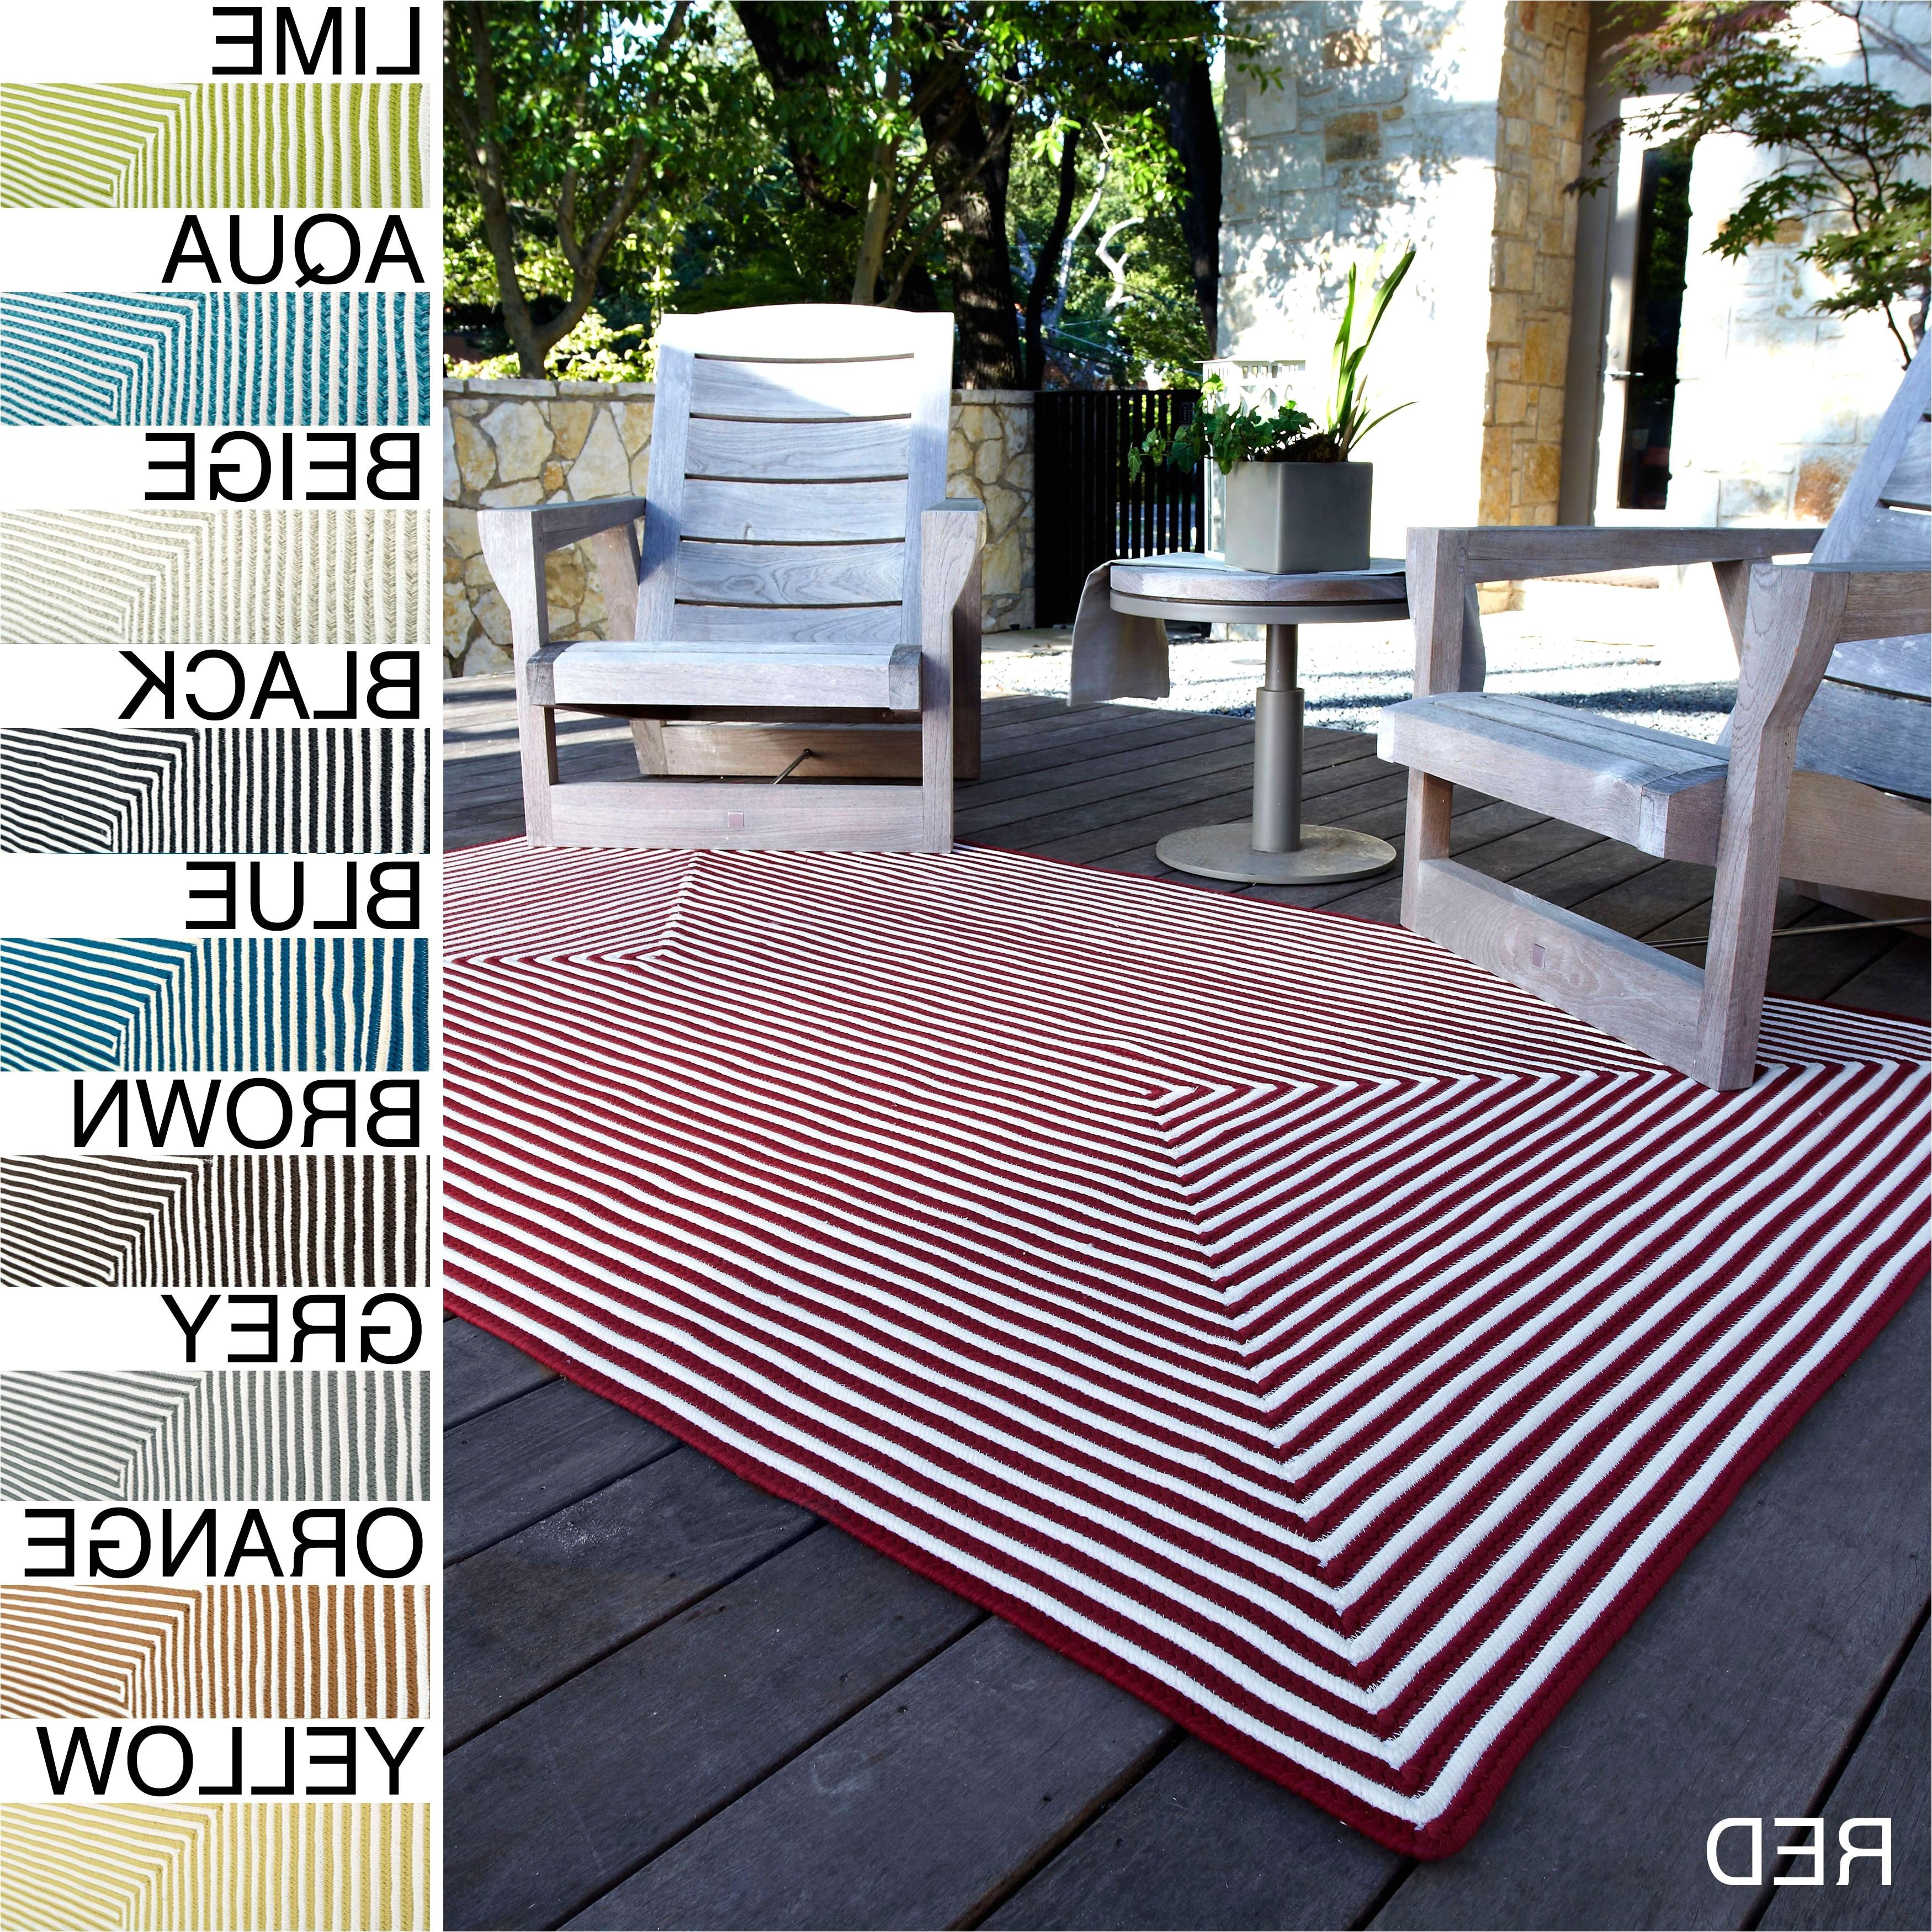 costco air mattress camping beautiful rv patio mats nice rv patio mat beautiful outdoor rugs amazon